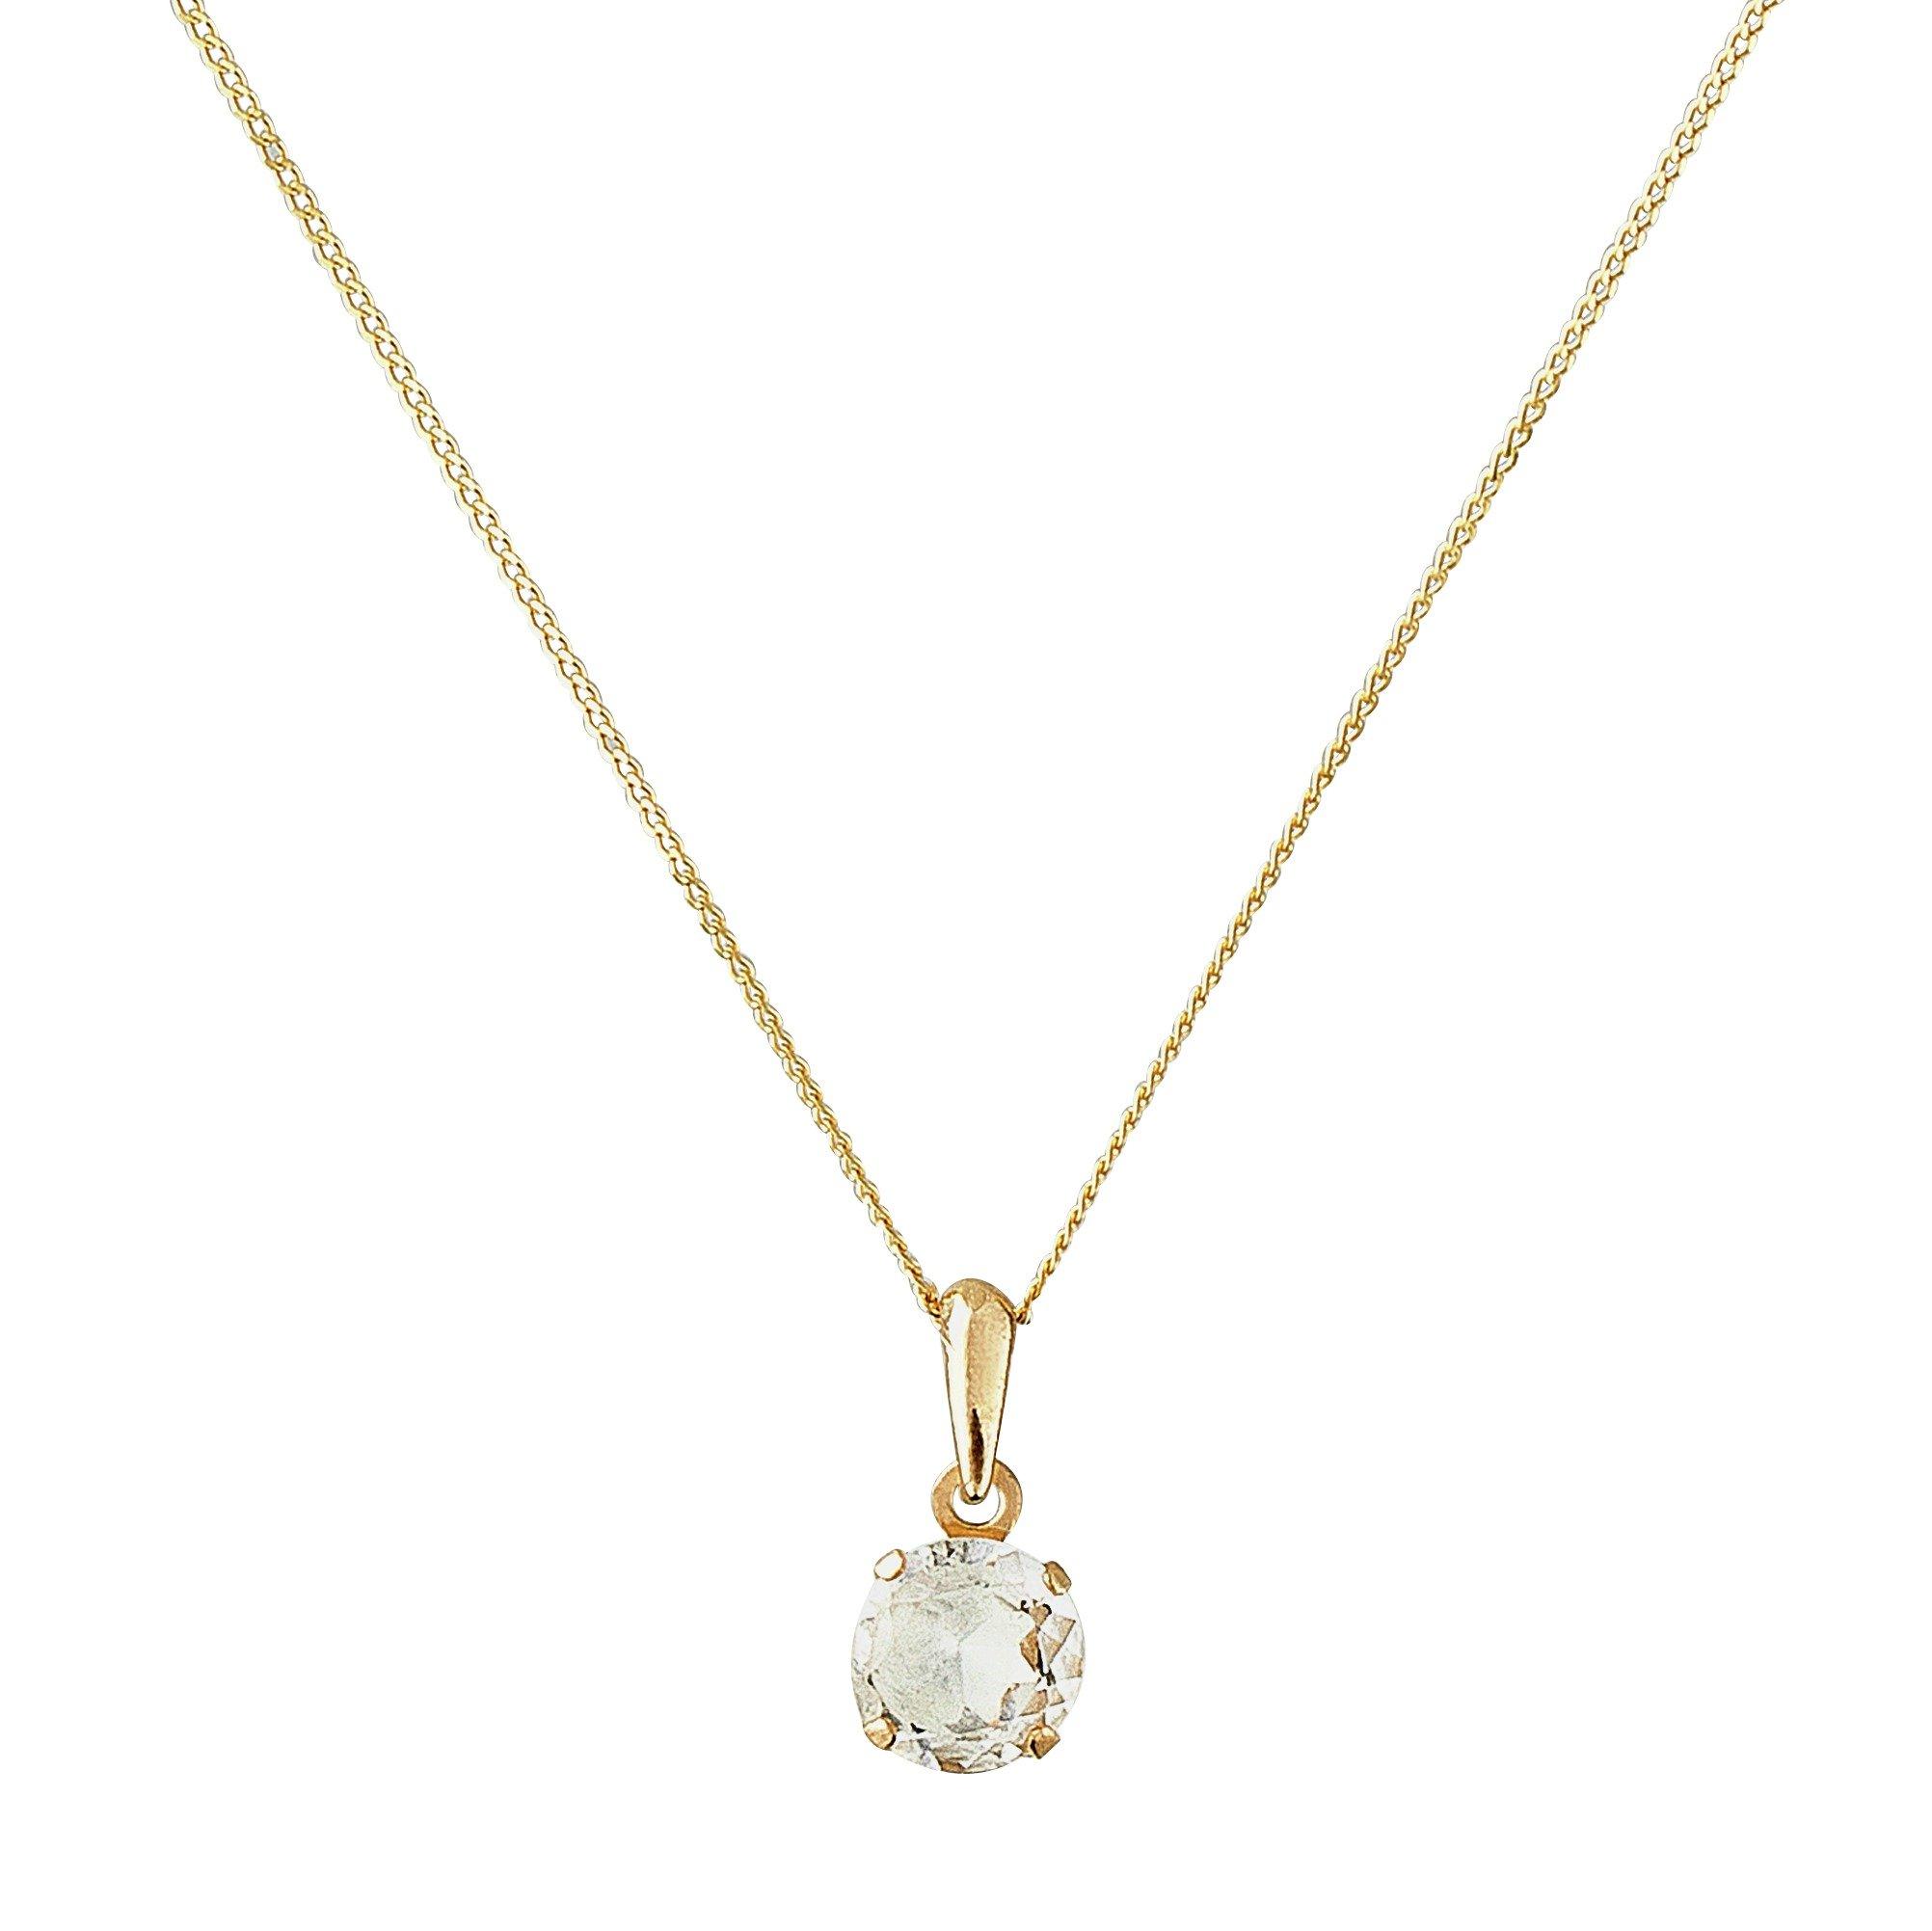 Revere 9ct Gold White Topaz 5mm Pendant 16 Inch Necklace